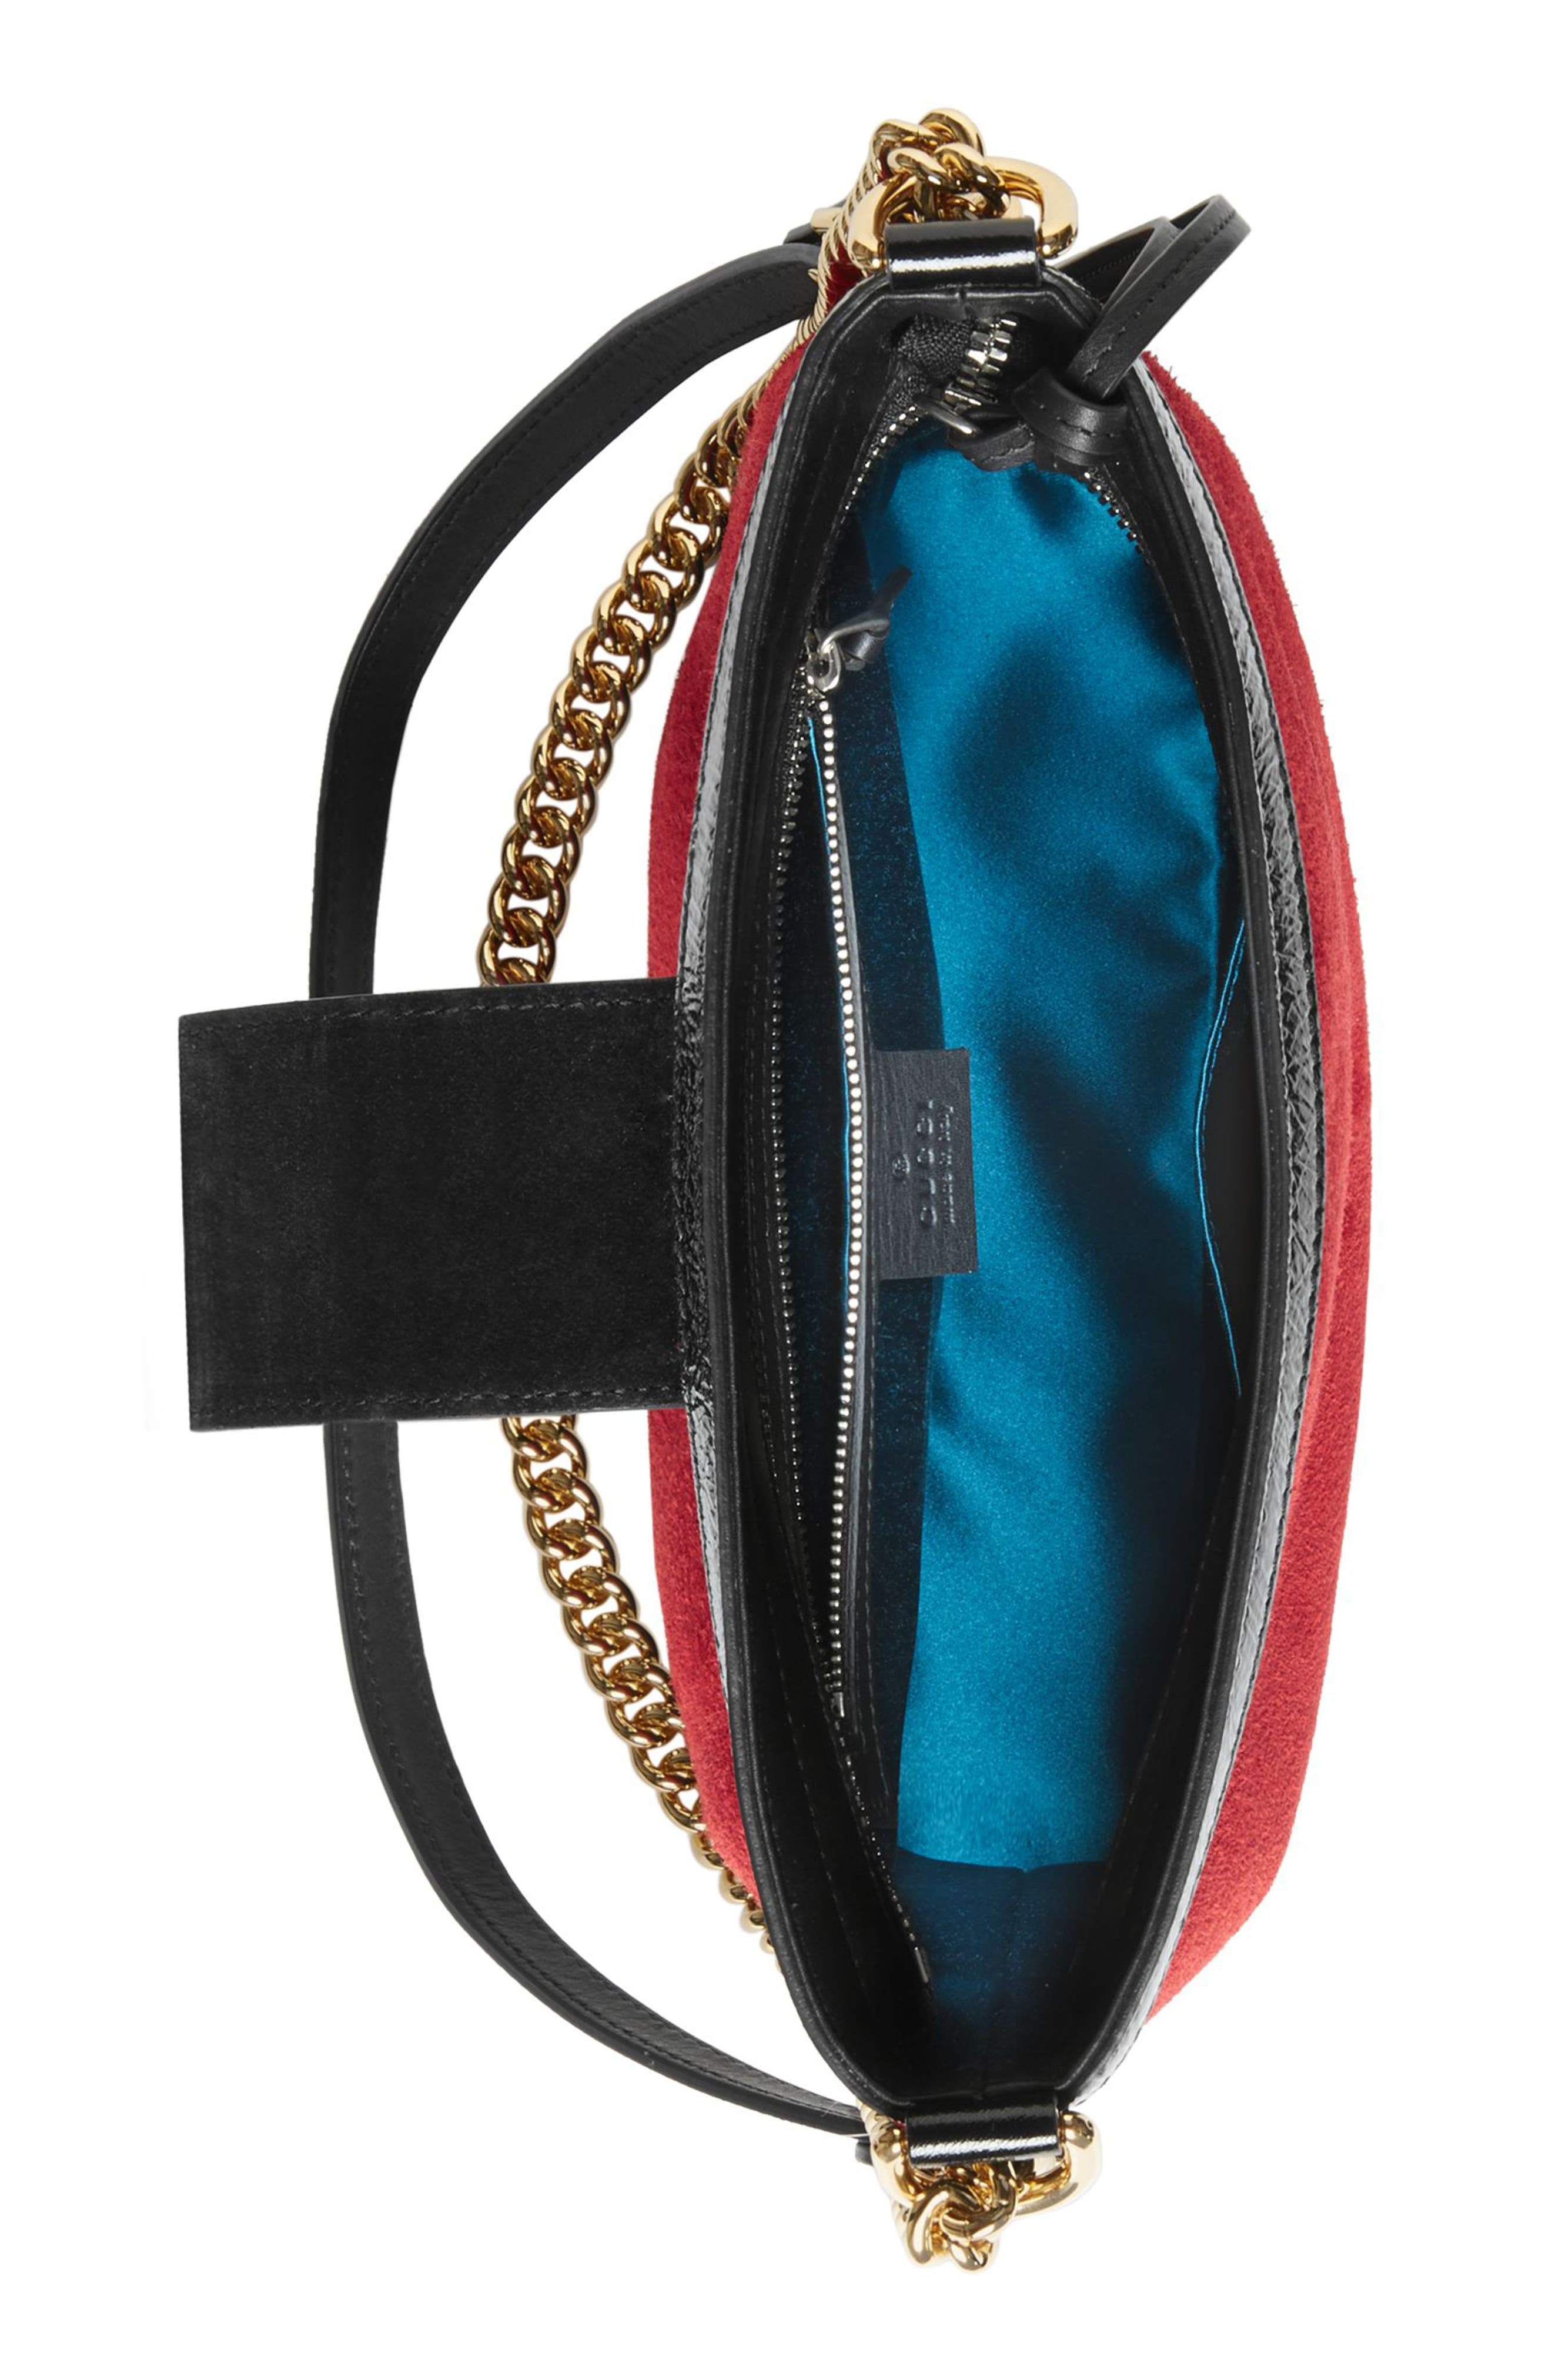 GUCCI,                             Medium Dionysus Suede Shoulder Bag,                             Alternate thumbnail 3, color,                             HIBISCUS RED/ NERO